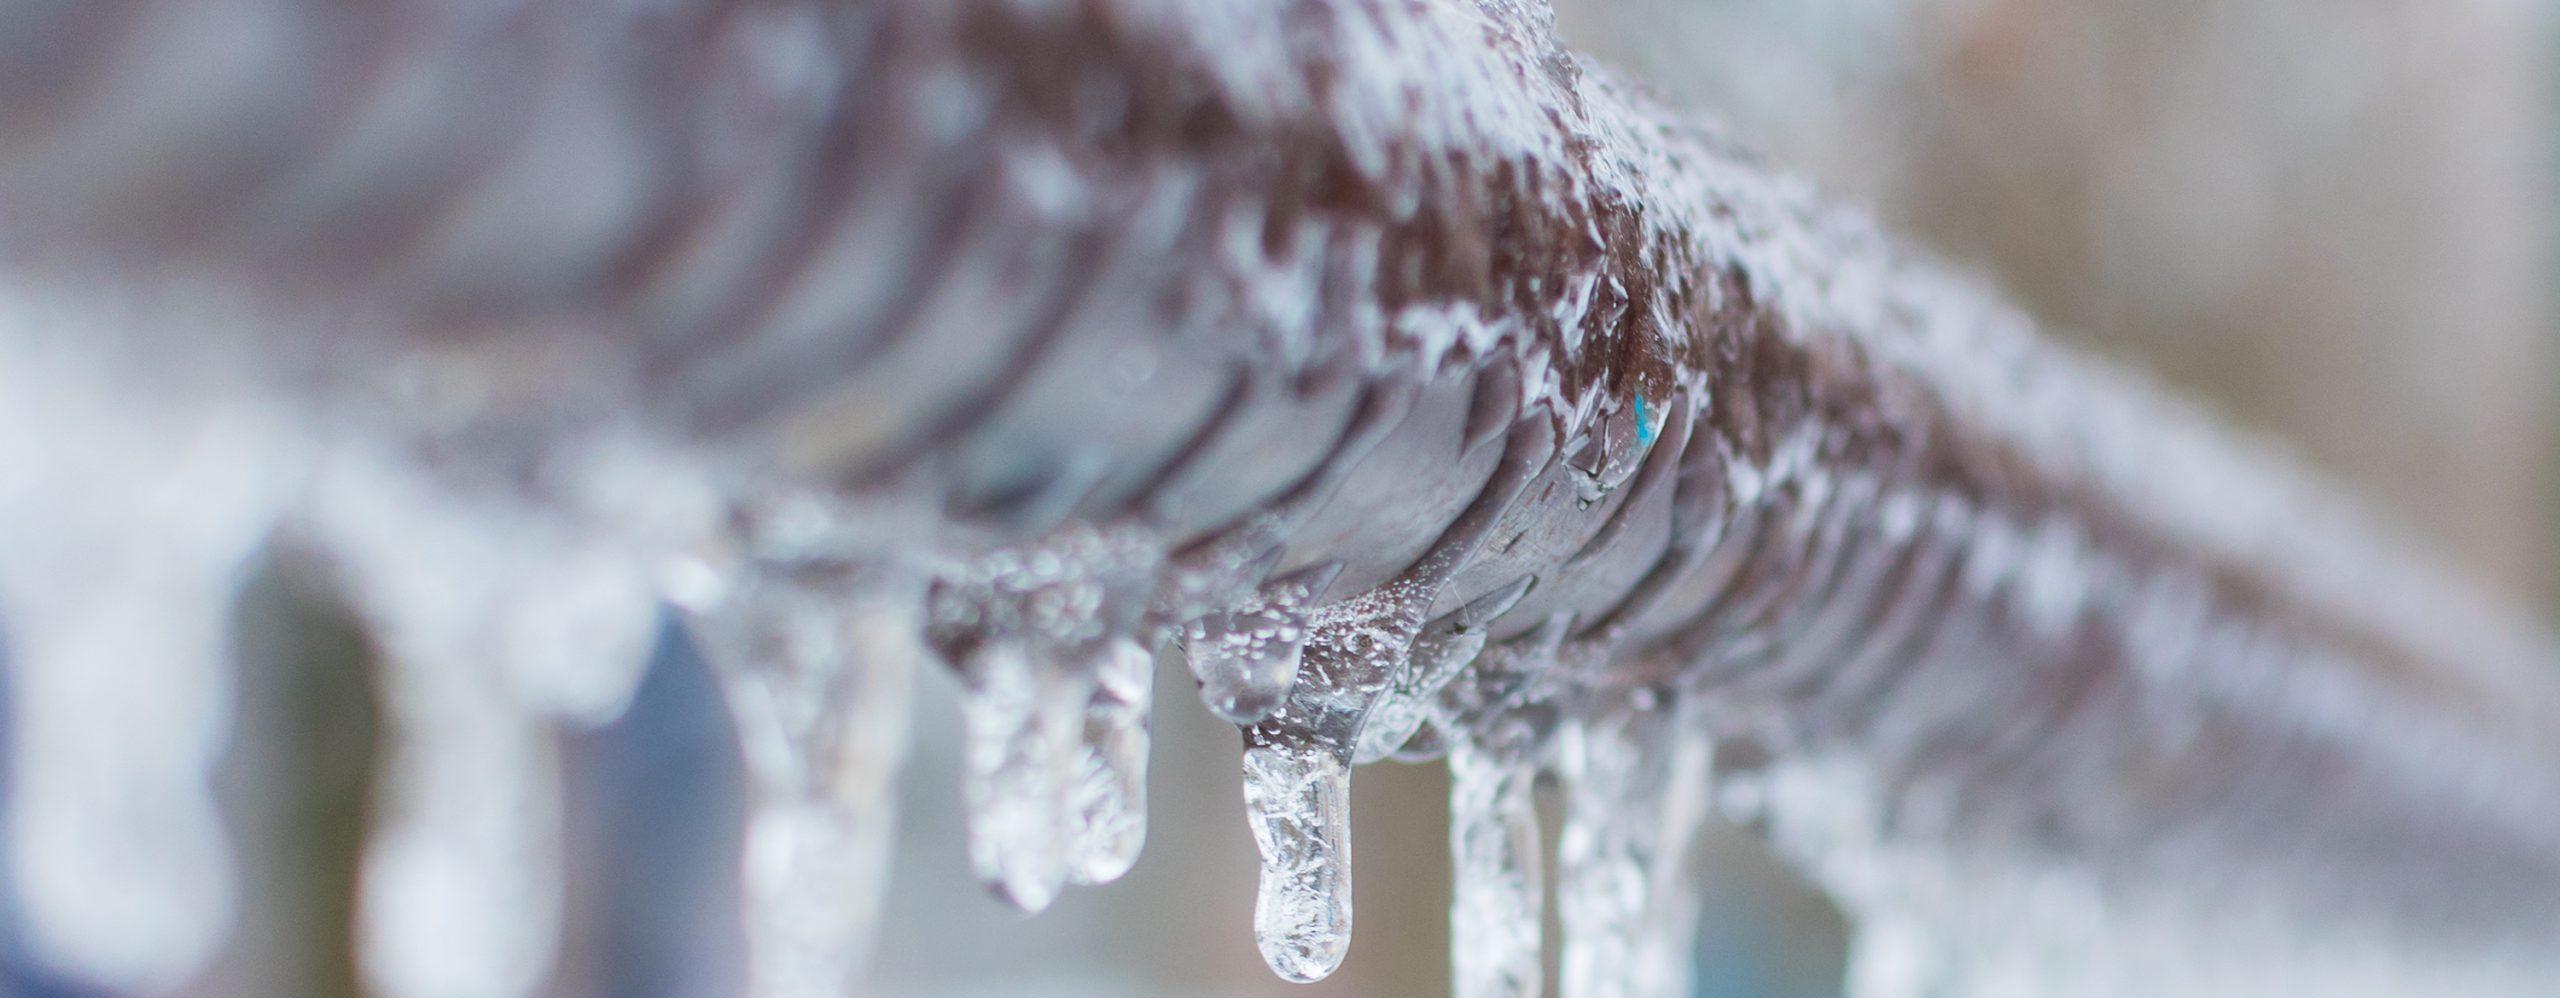 Winterisation frozen pipes